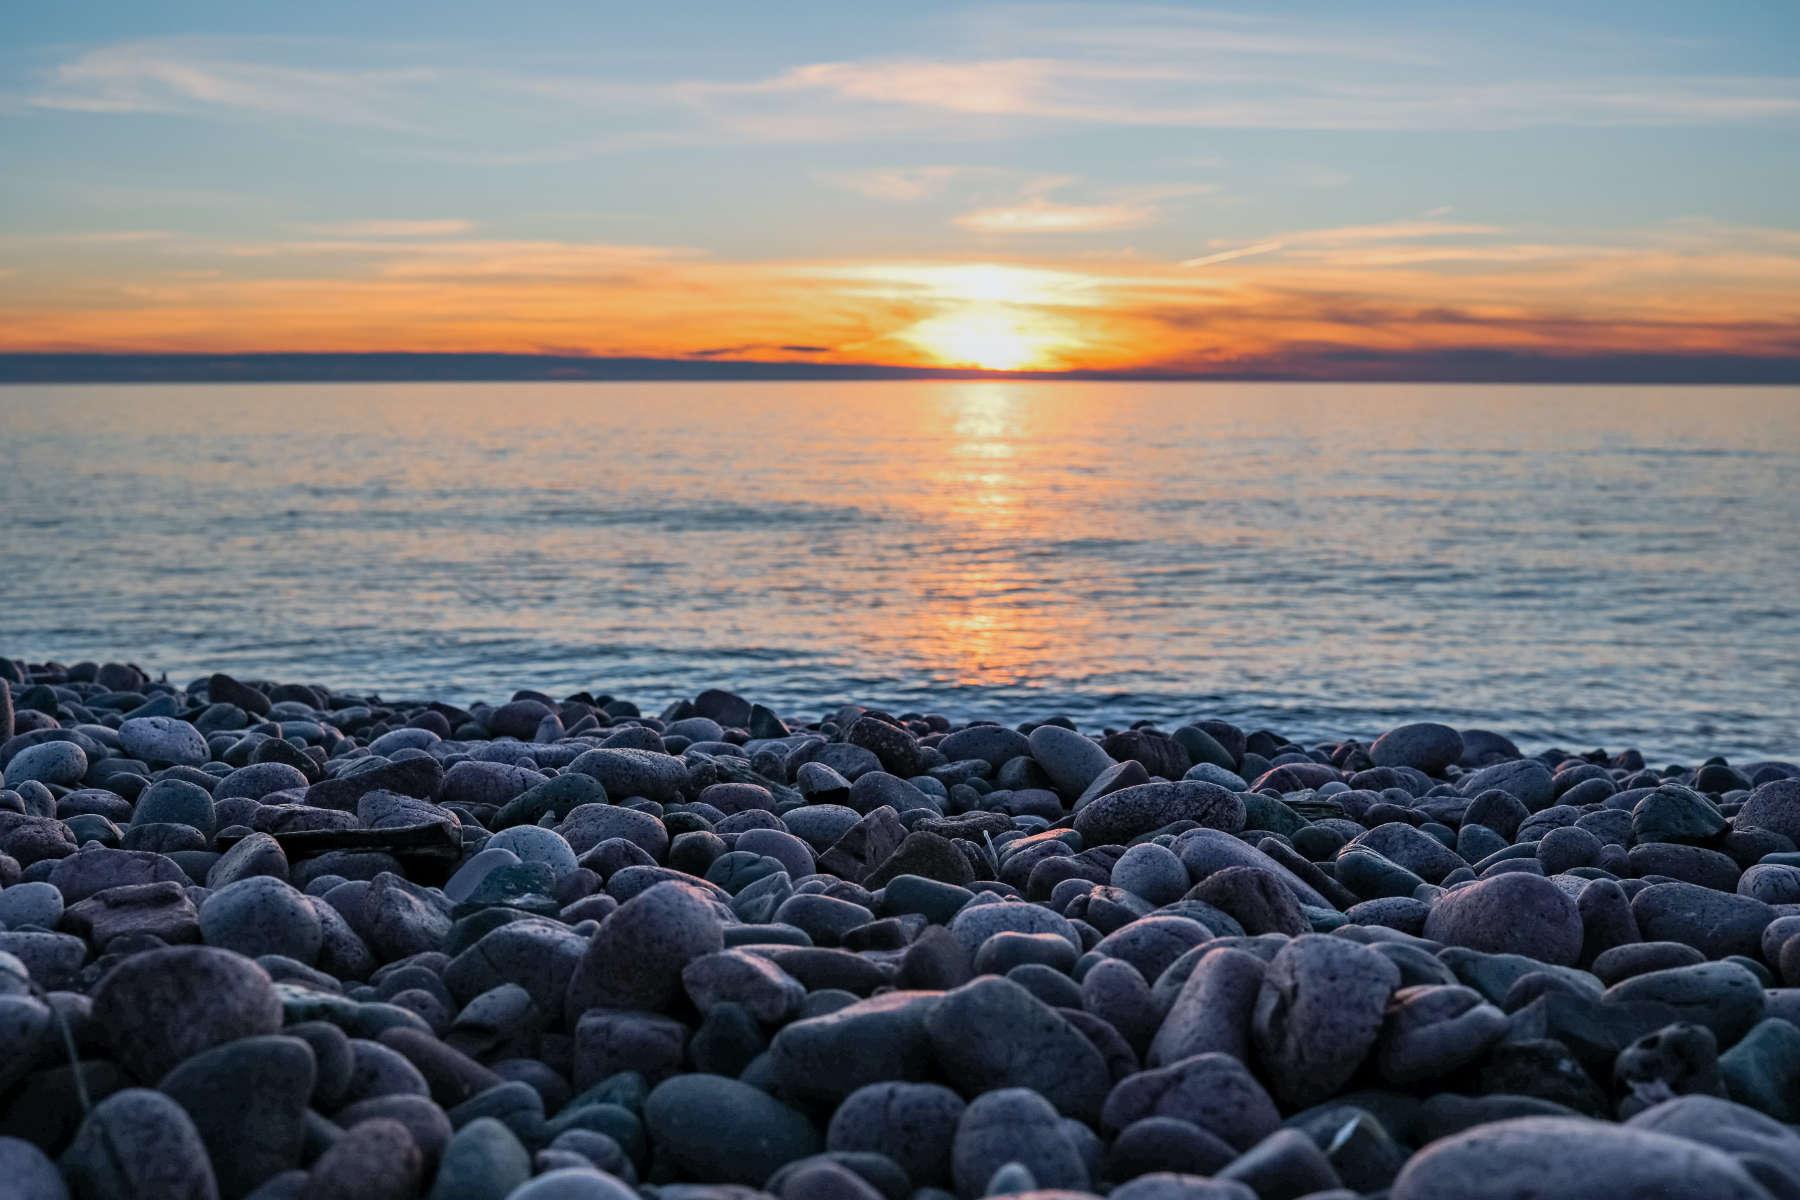 Sun sets on a placid lake, the coast is rocky.